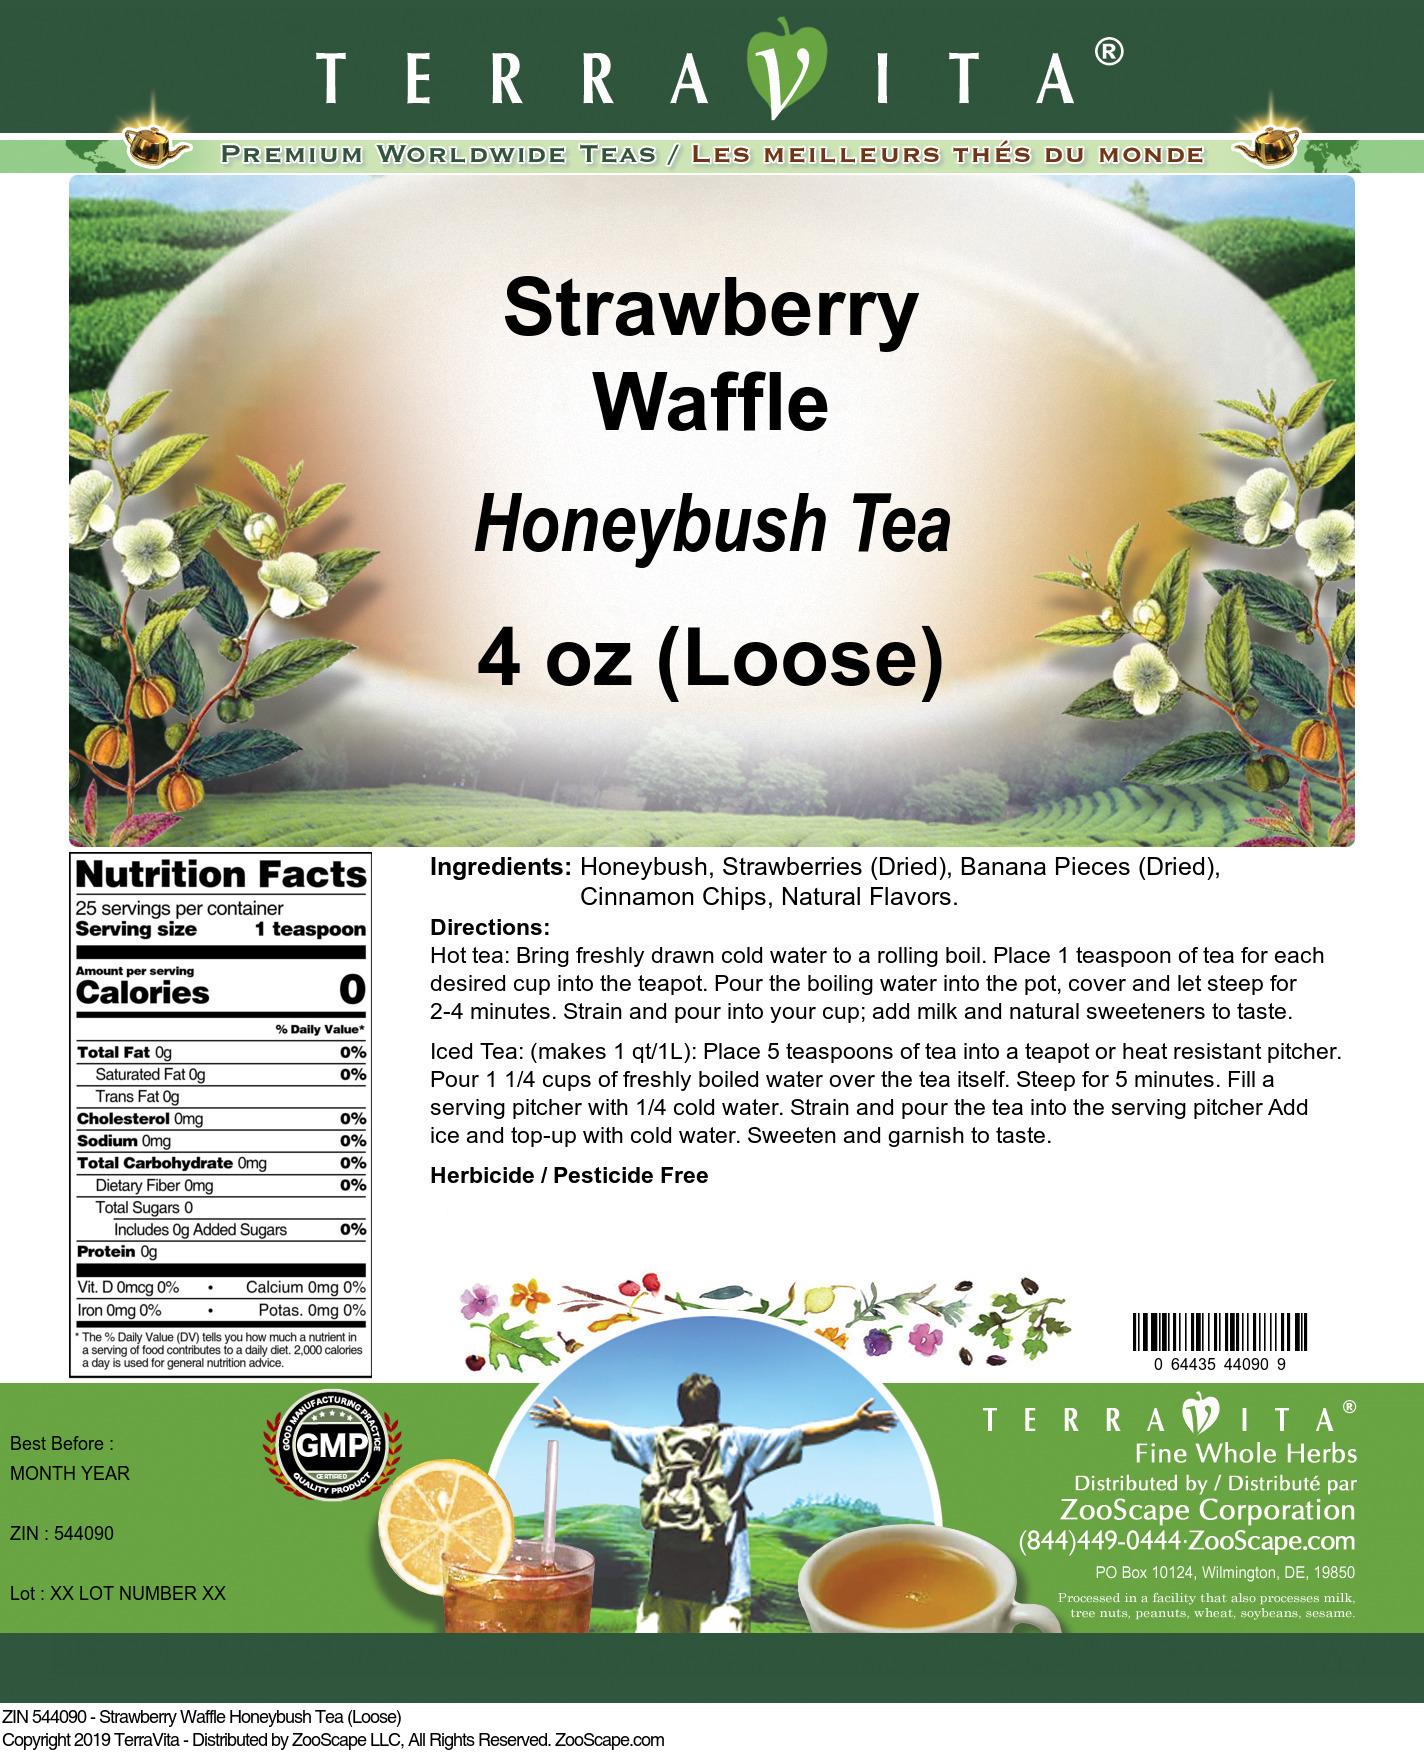 Strawberry Waffle Honeybush Tea (Loose)